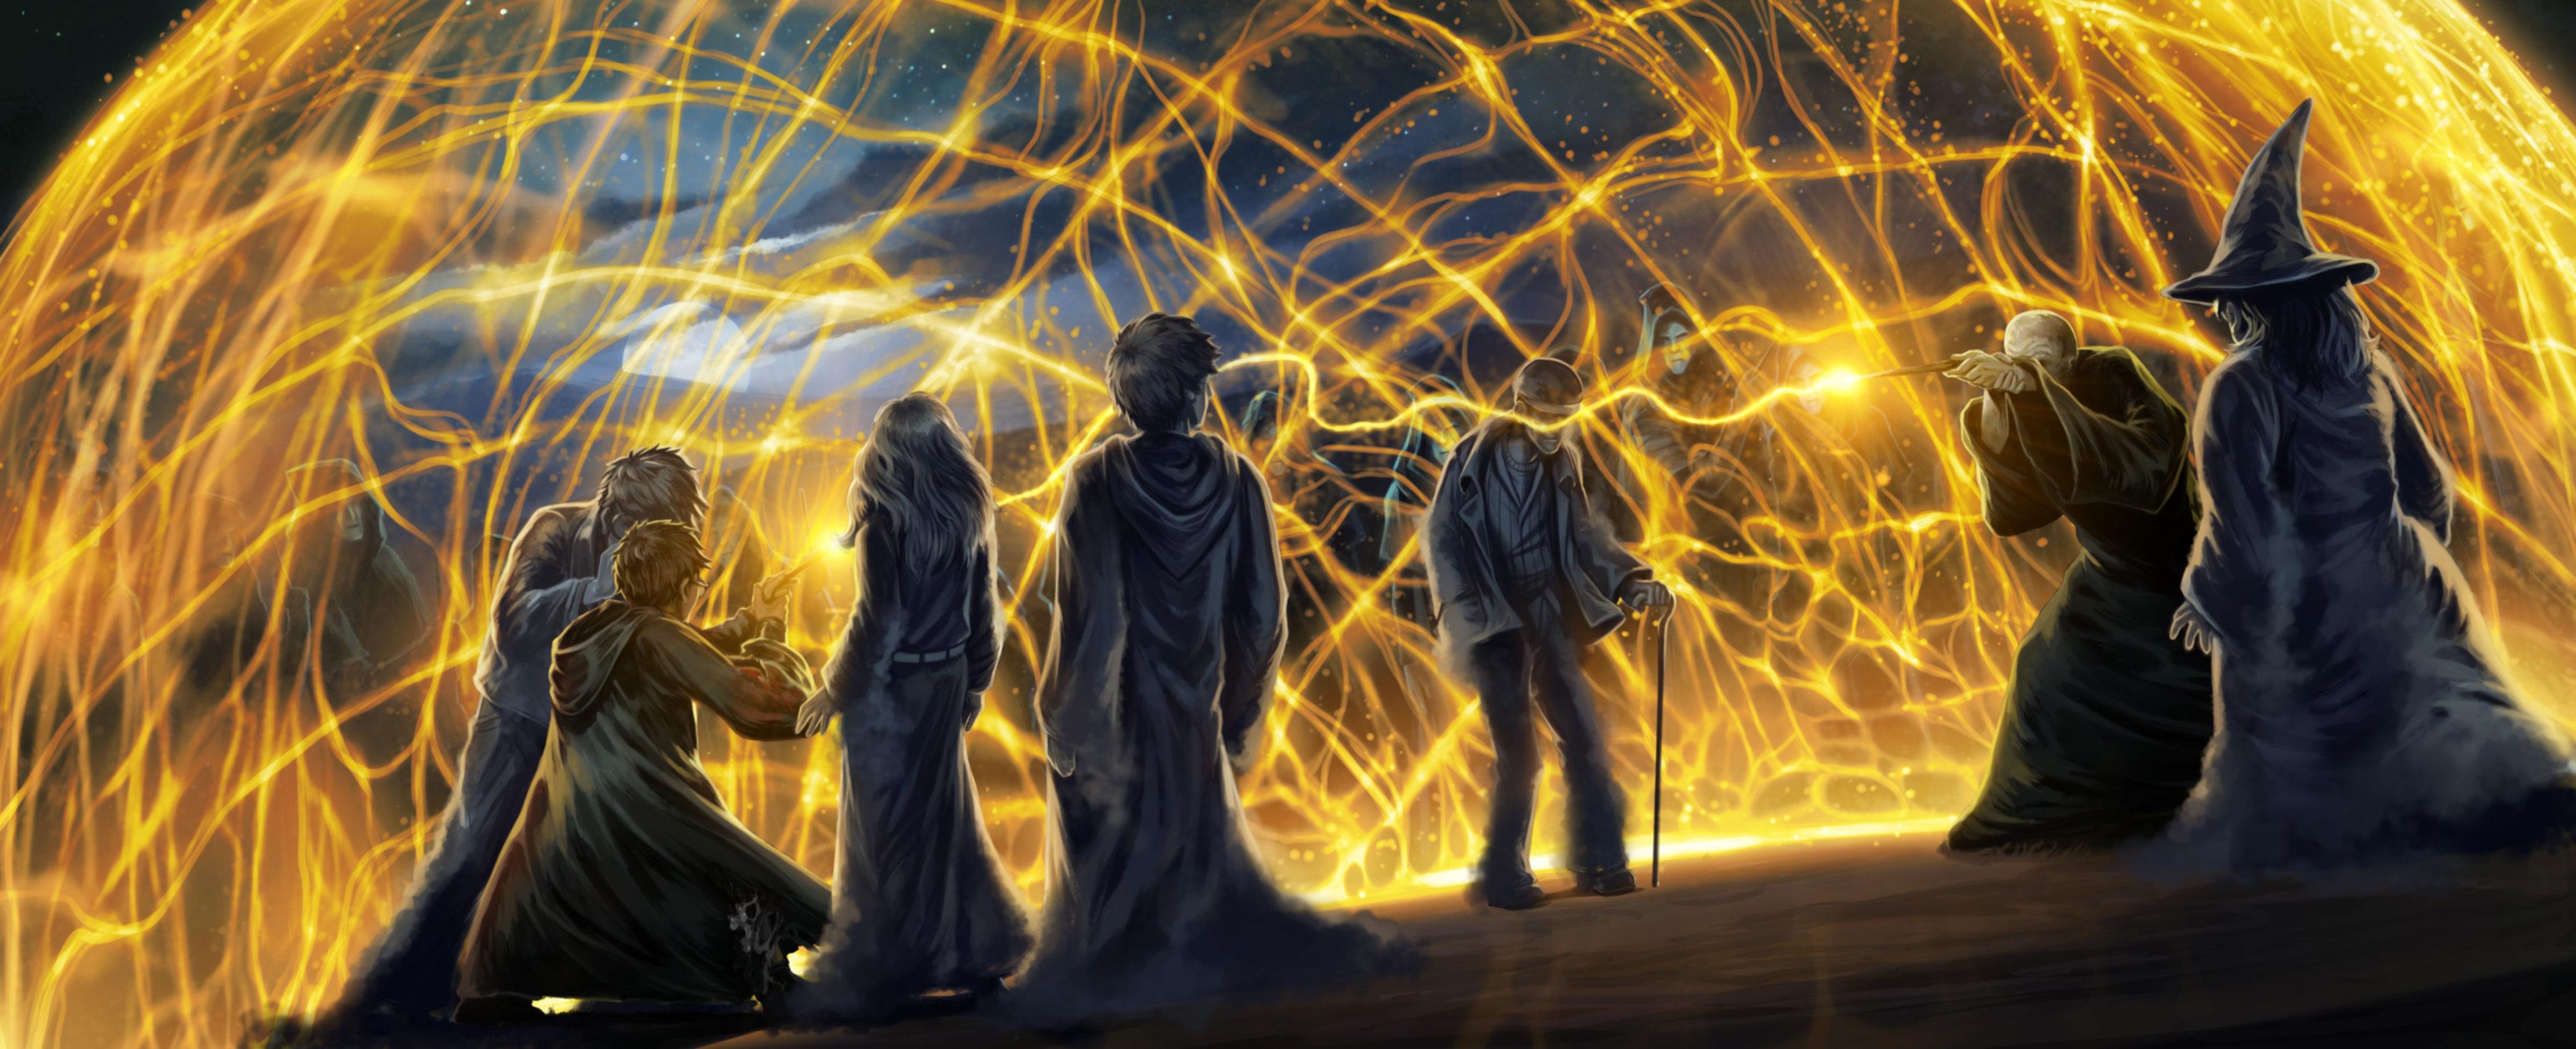 Expelliarmus Exploring Harry Potter S Signature Spell Wizarding World